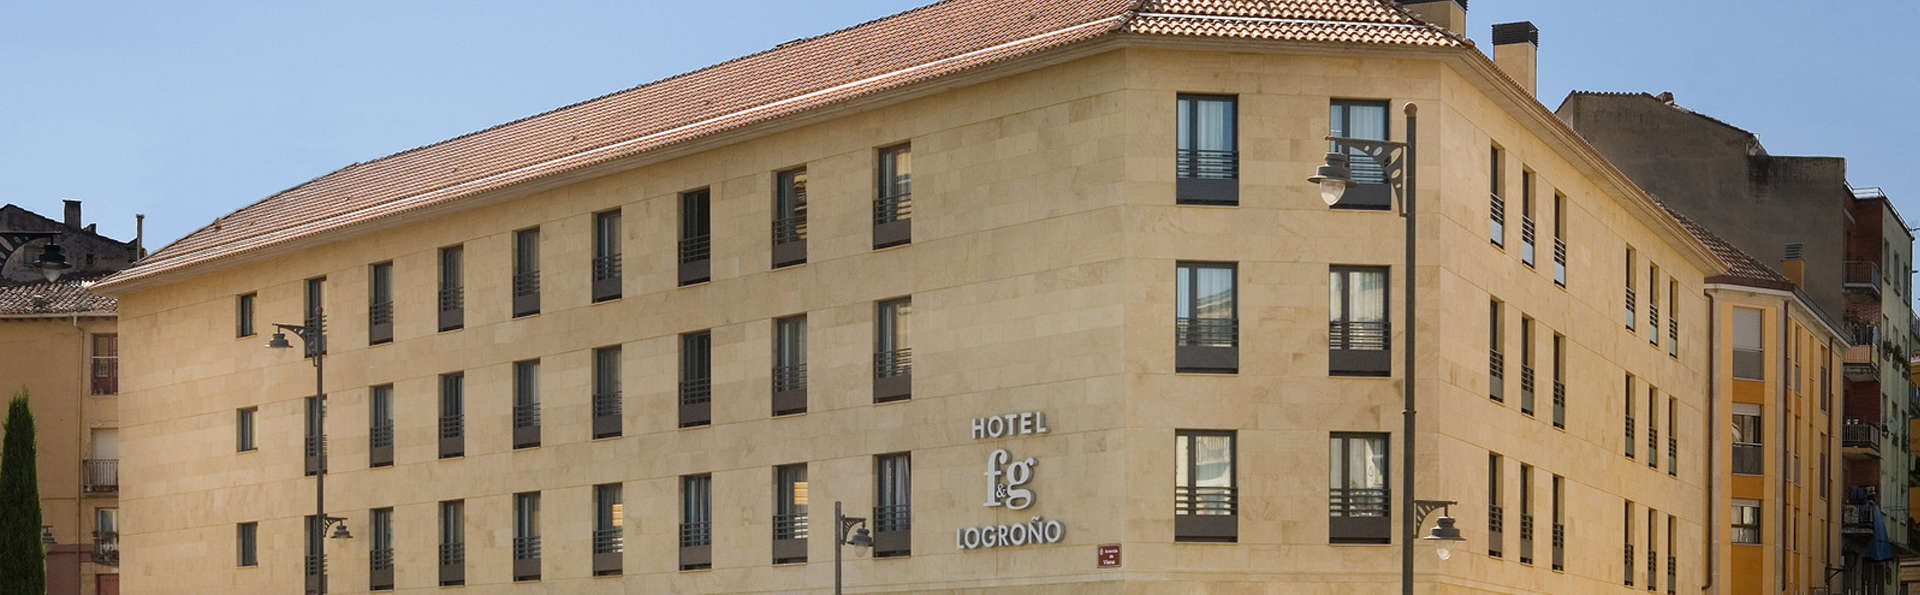 Hotel FG Logroño - edit_front_day.jpg